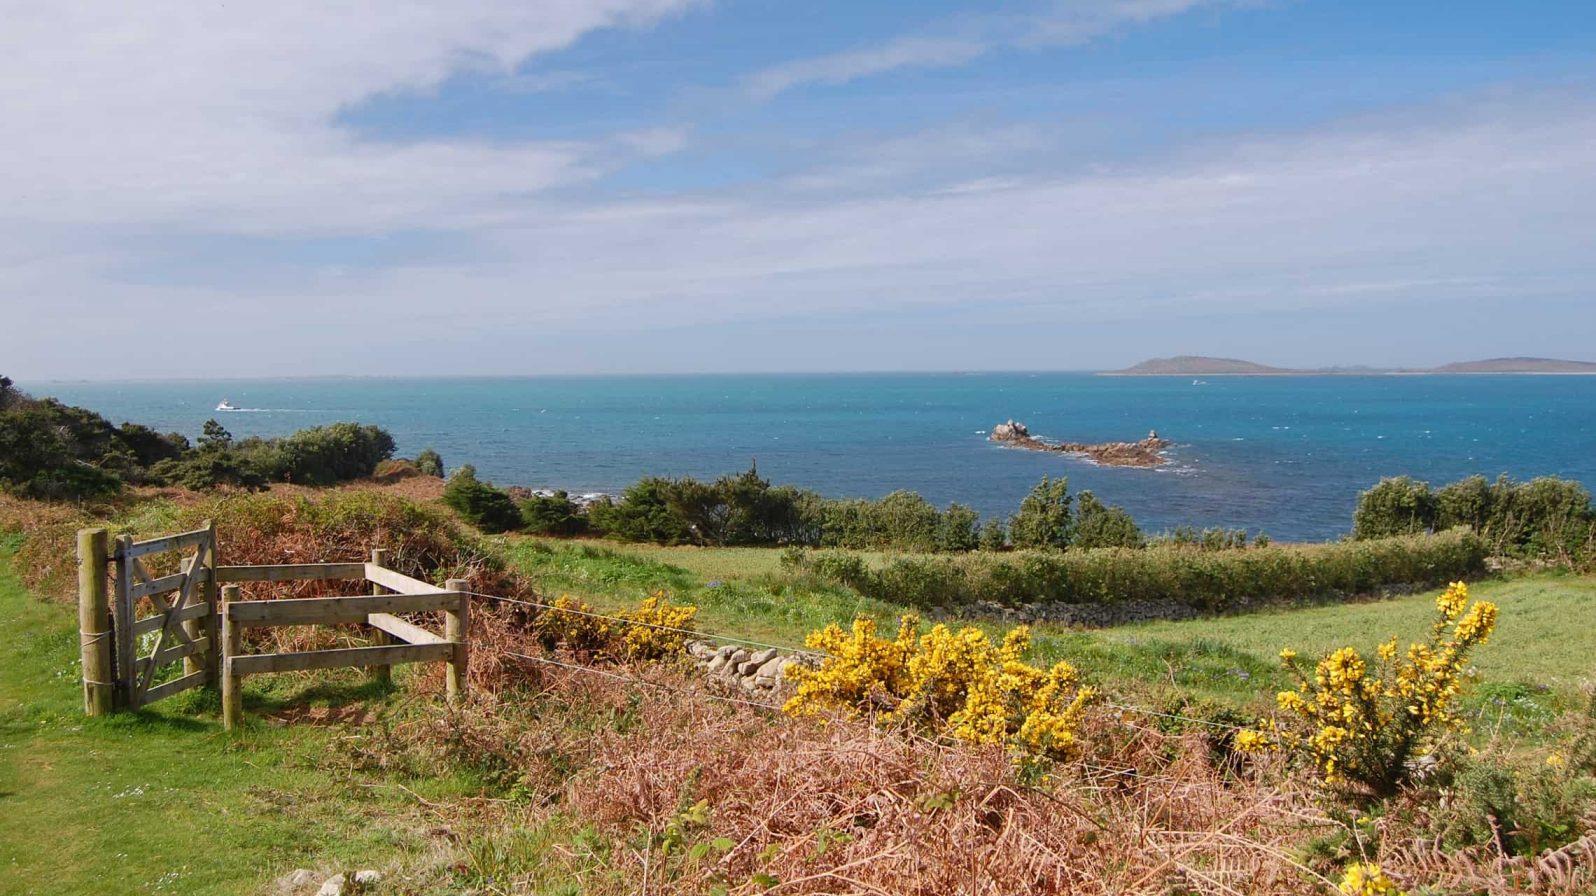 St-Marys-Scillyn-saaret-Iso-Britannia-1596x896.jpeg